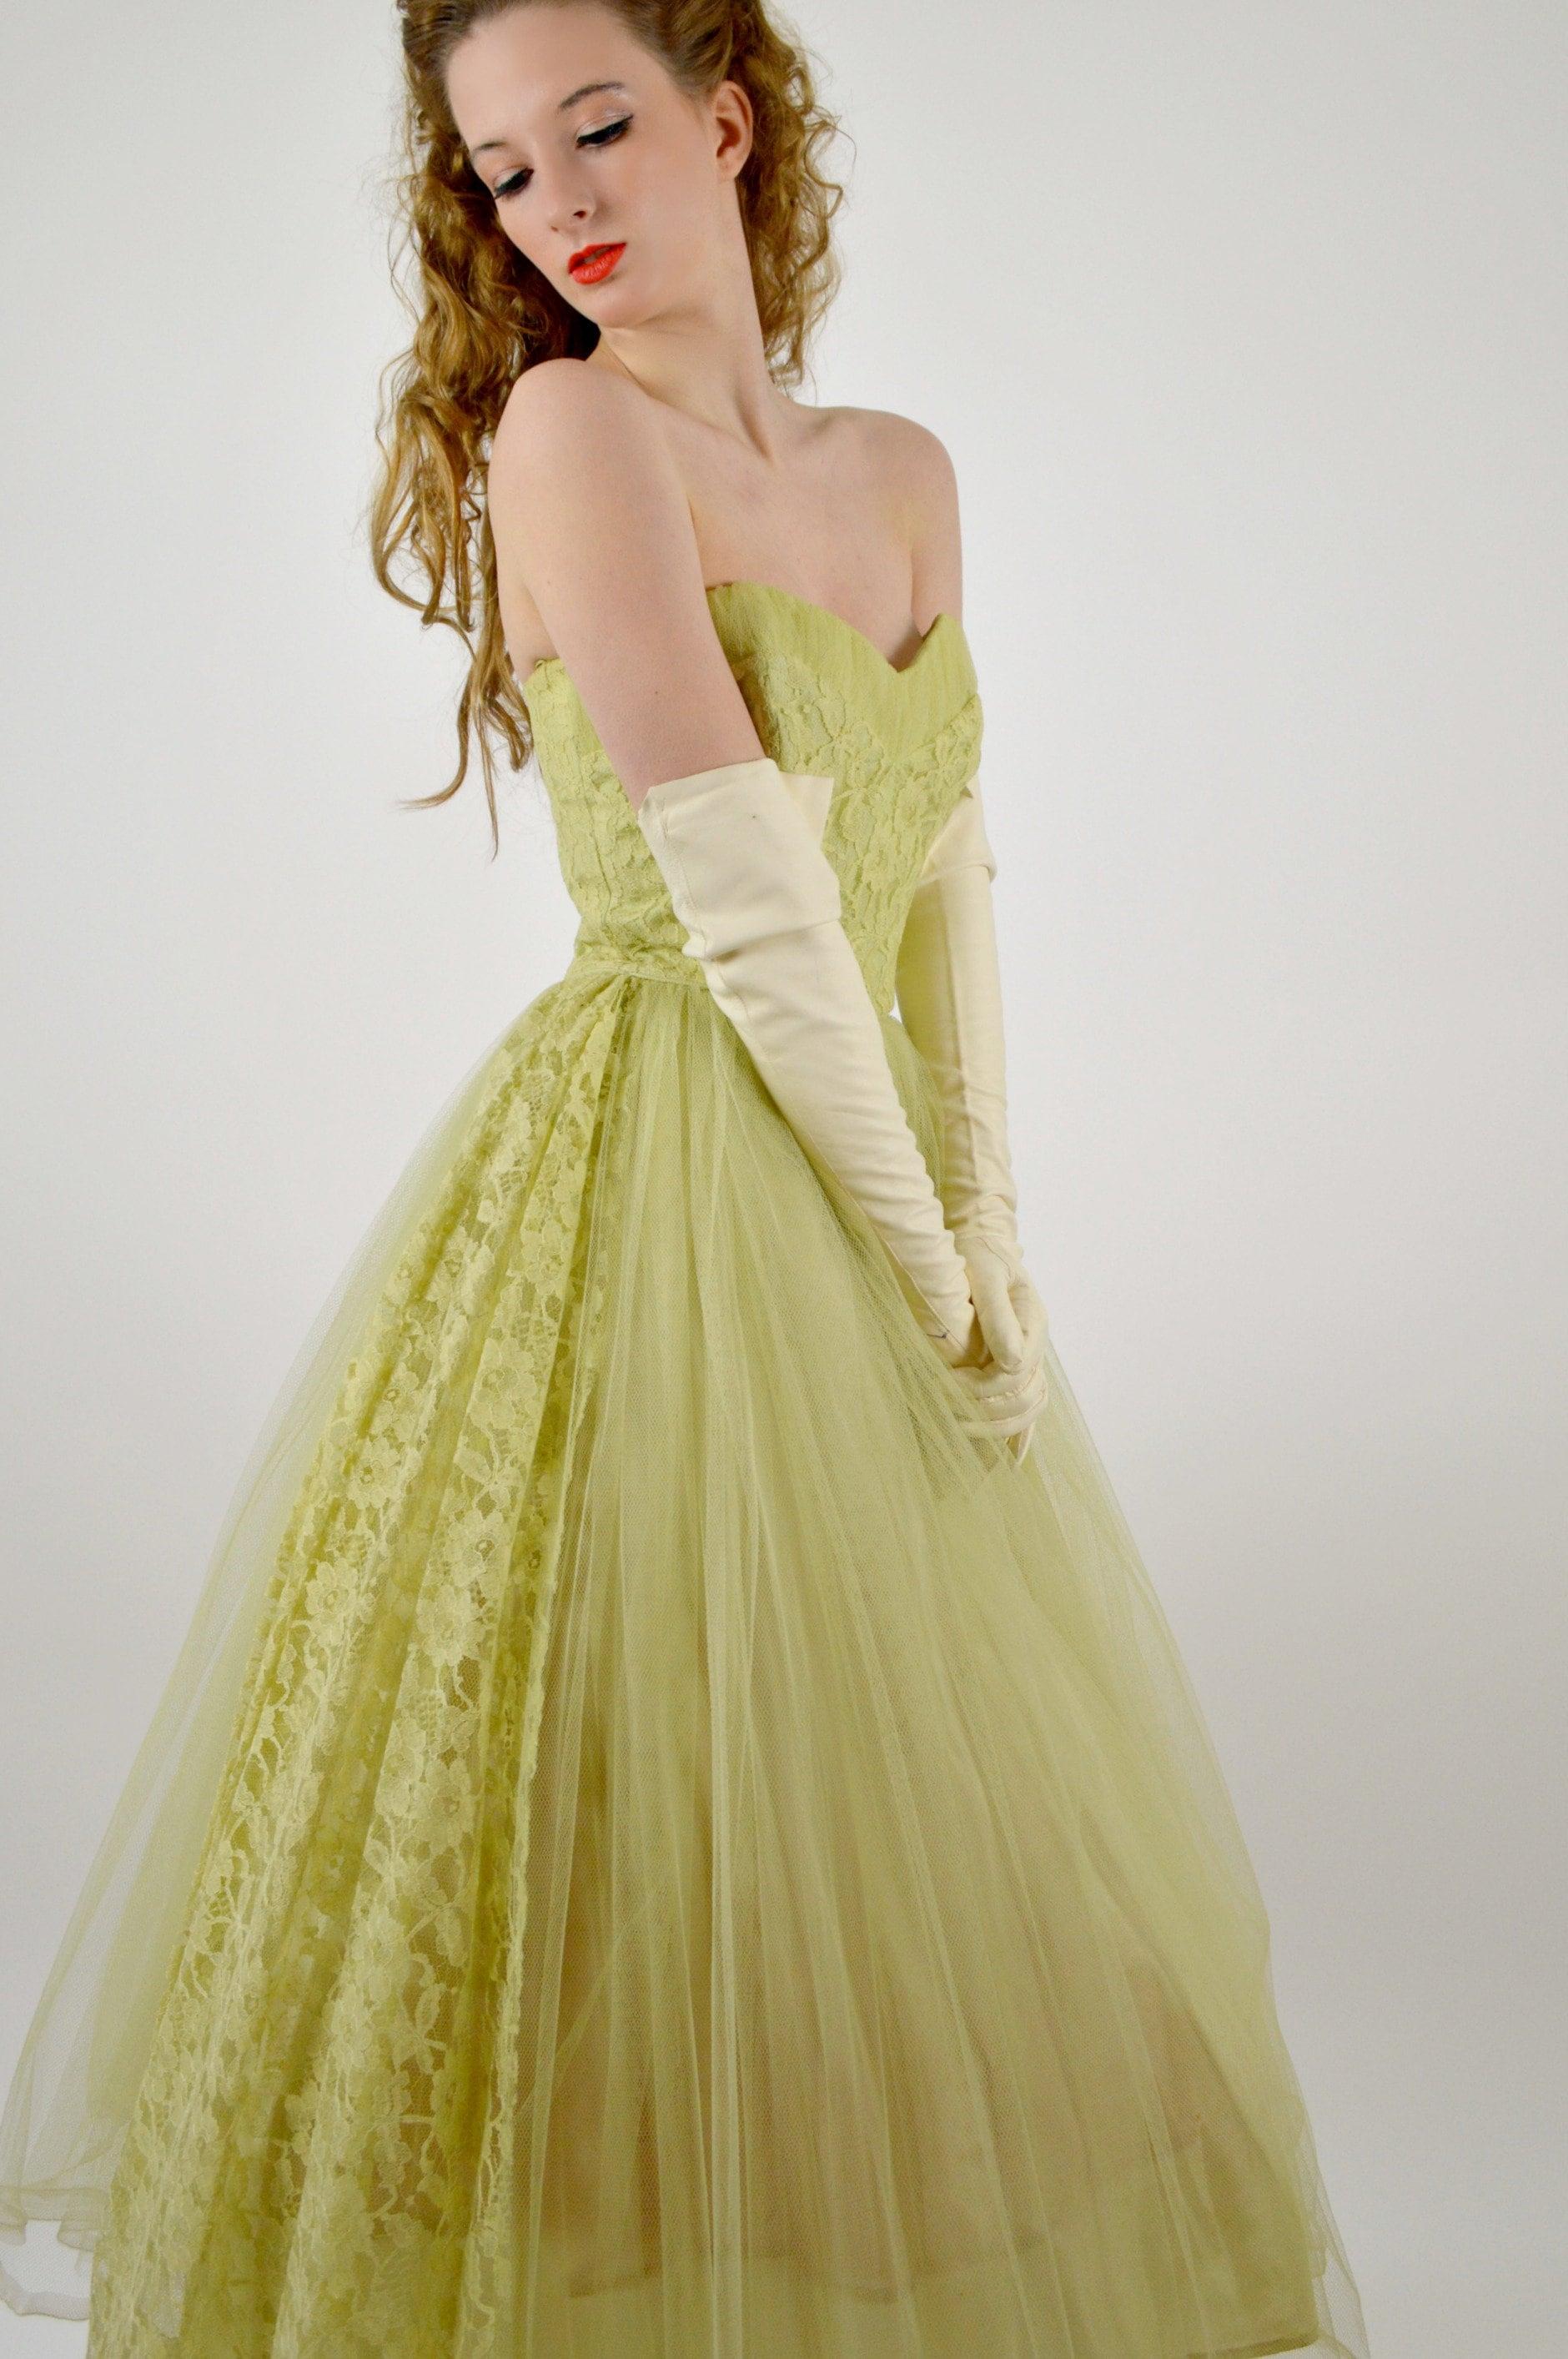 c2908b3ea21a 1950s Prom Dress Cupcake Dress Green Tulle 50s Prom Dress | Etsy